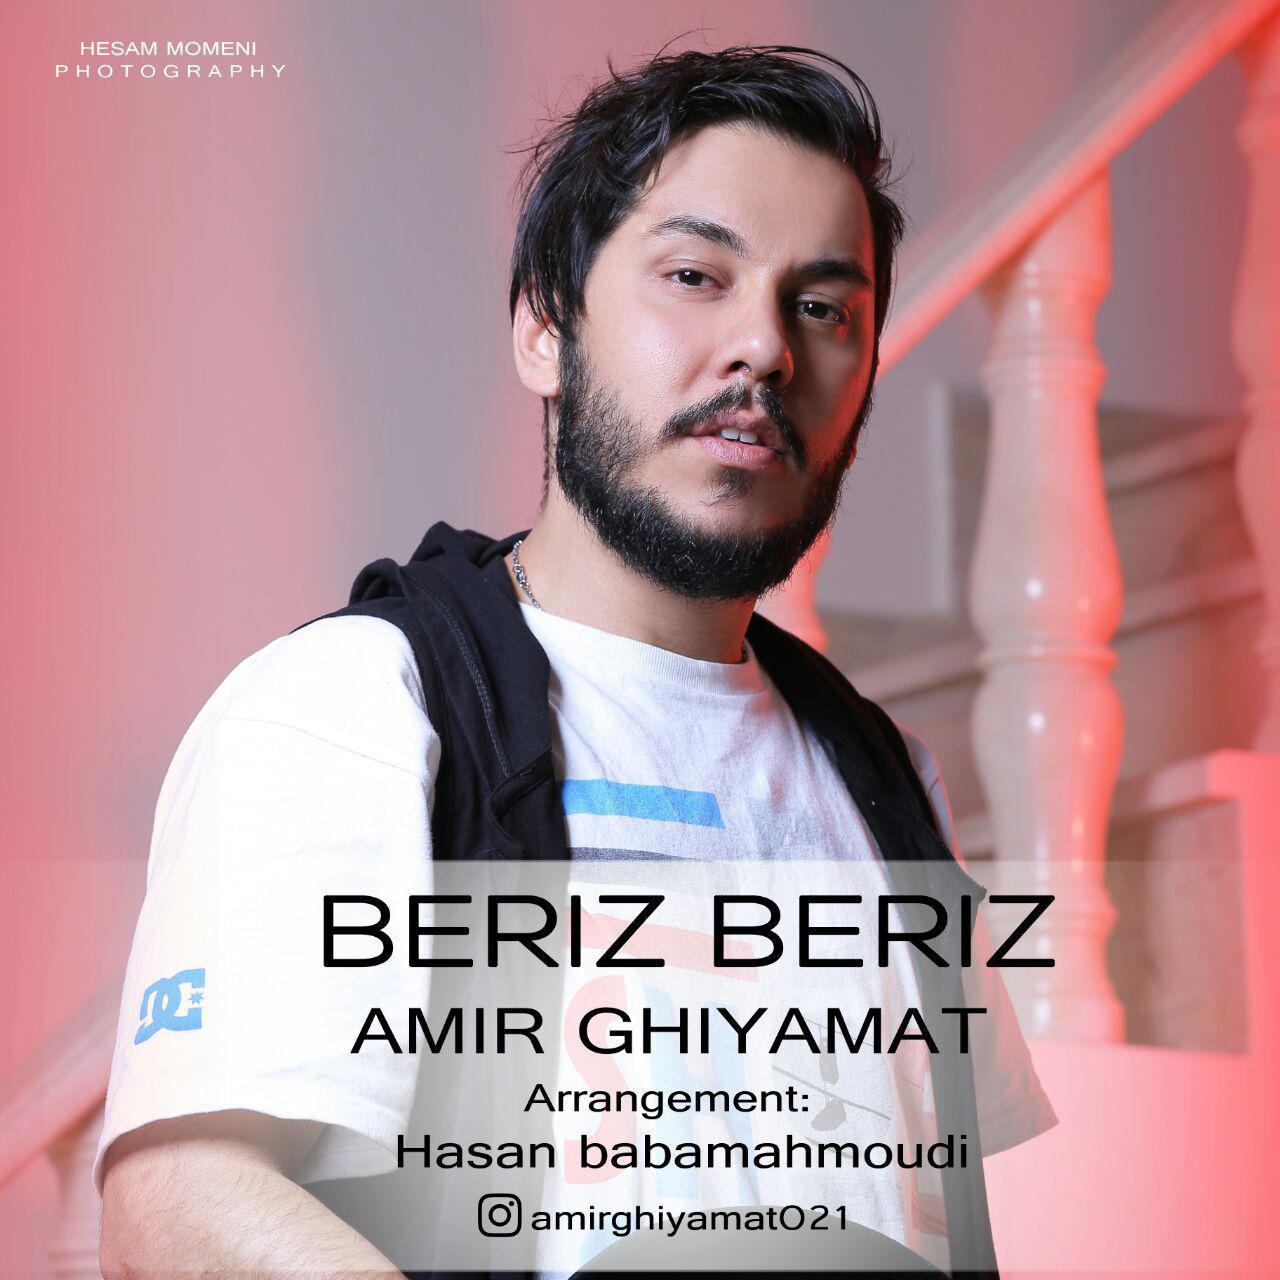 Amir Ghiyamat - Beriz Beriz Music | آهنگ امیر قیامت - بریز بریز